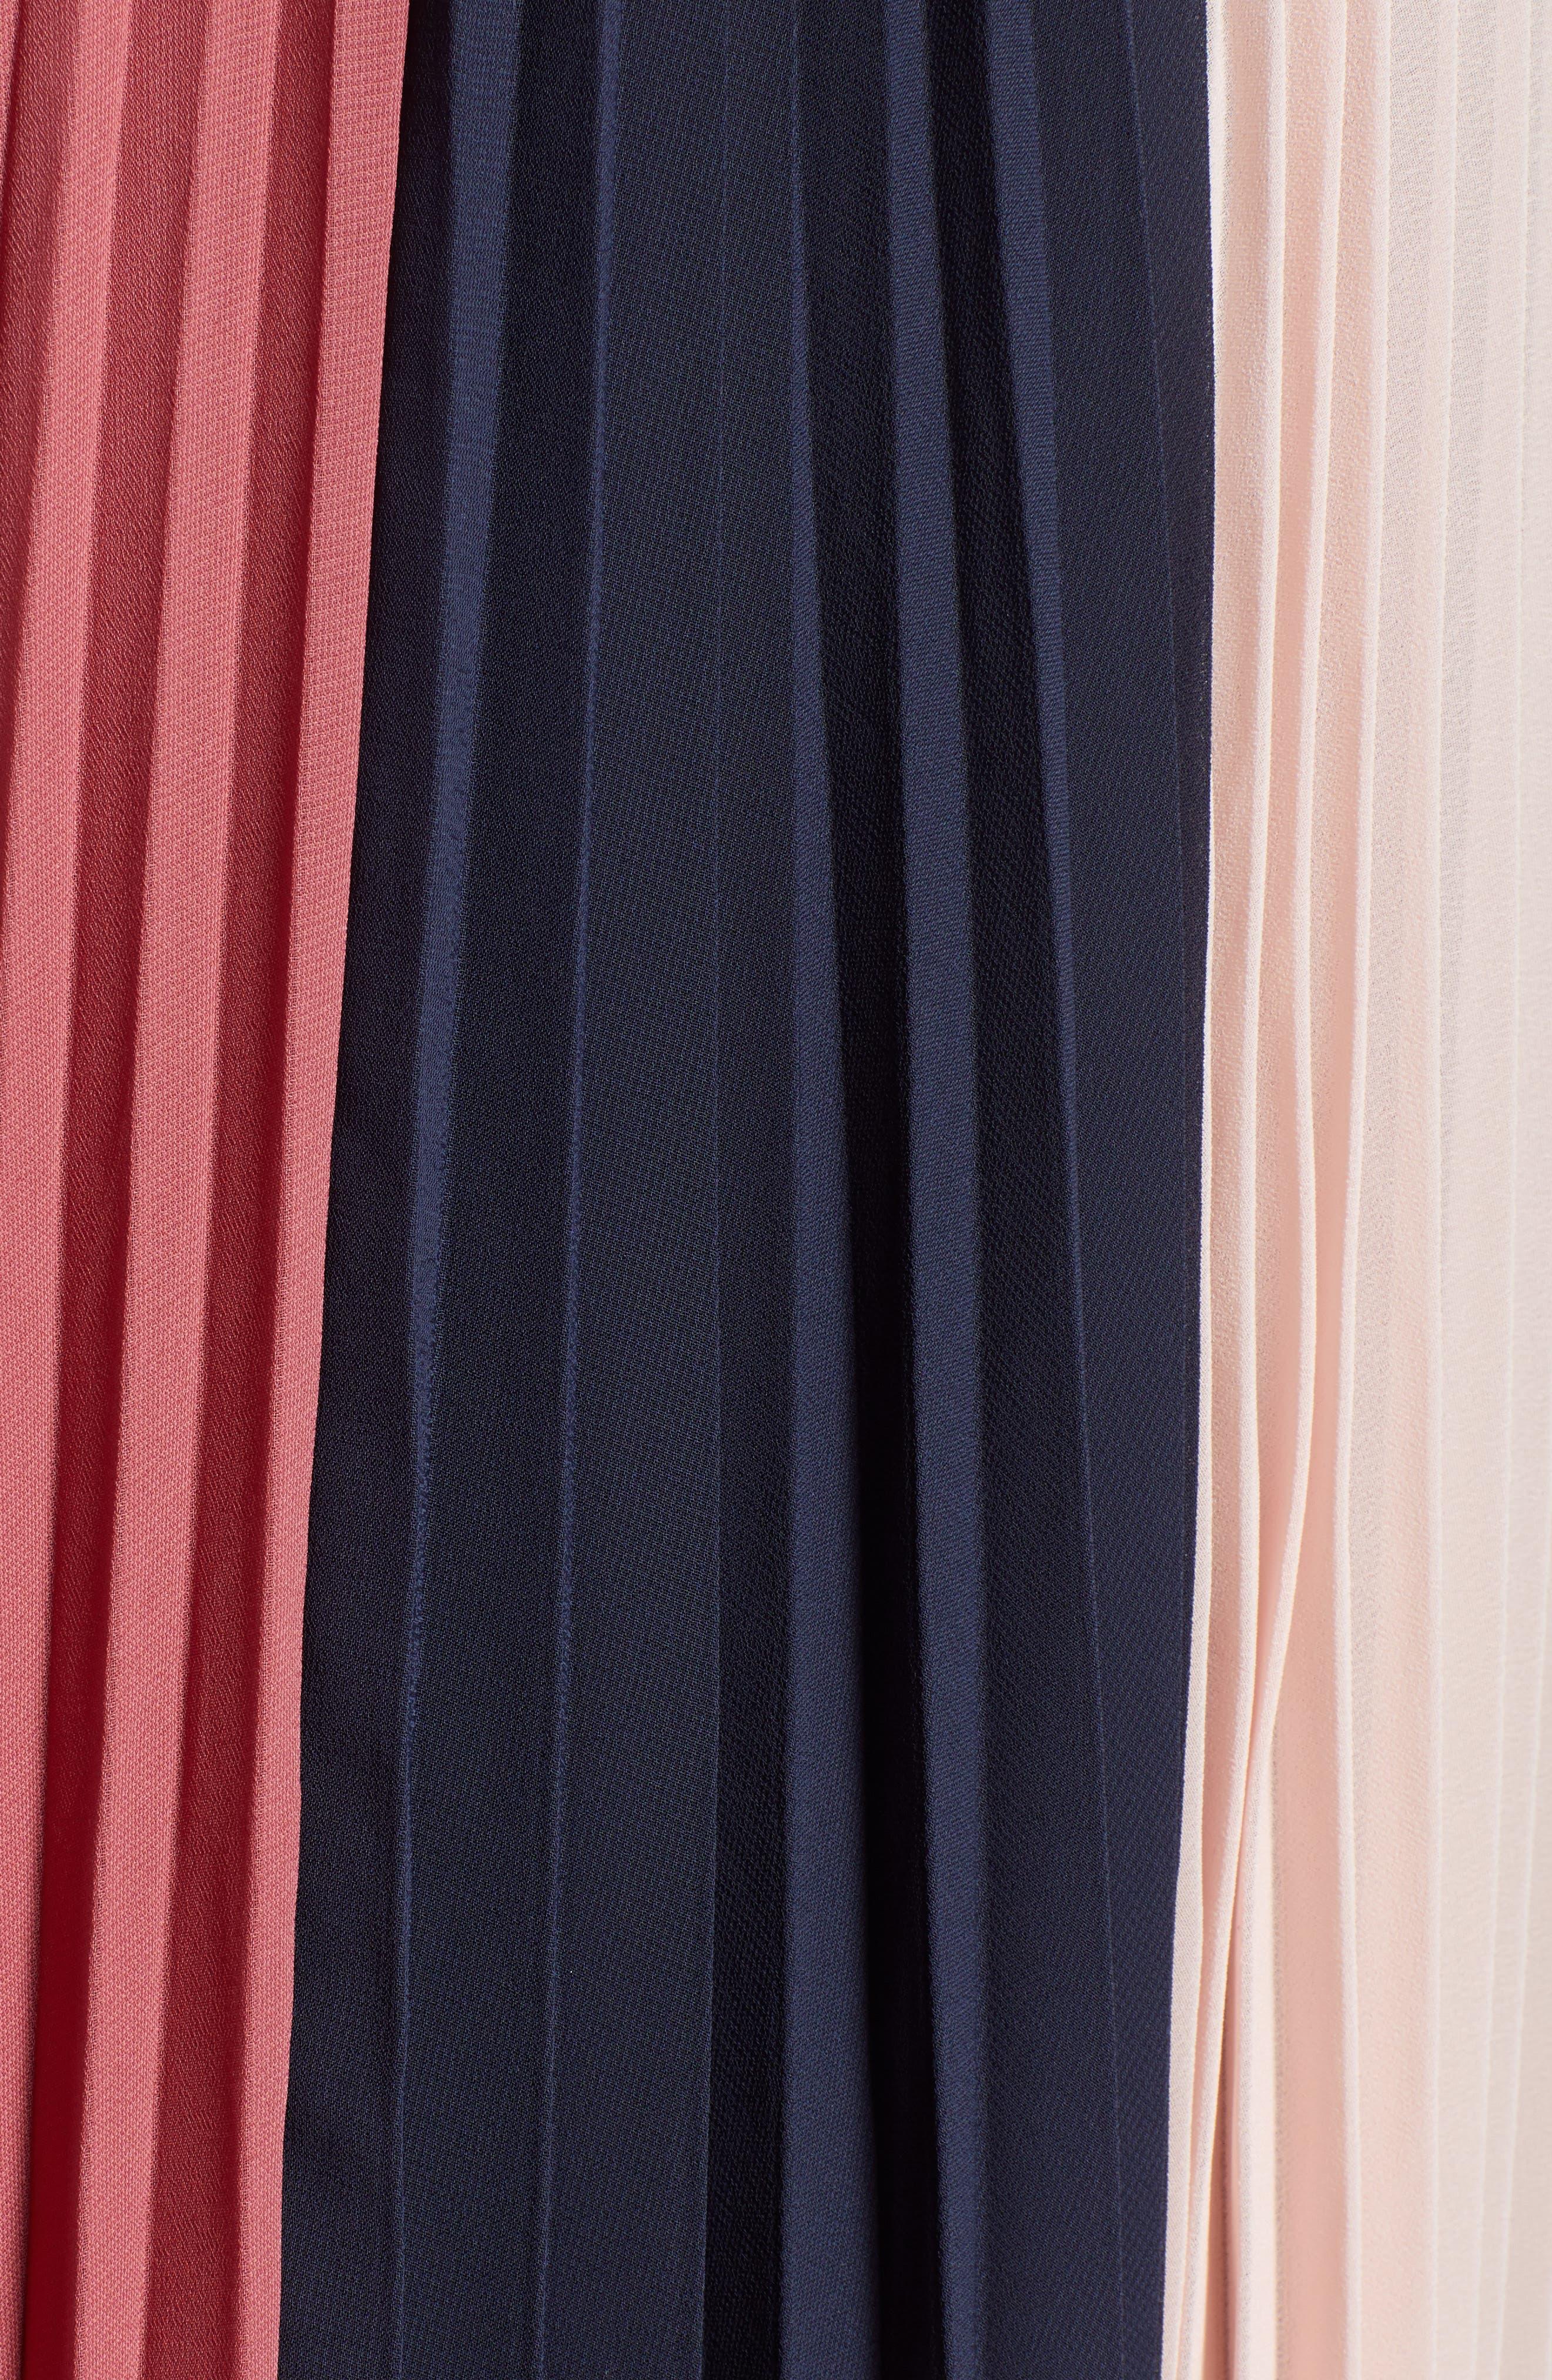 x Atlantic-Pacific Colorblock Pleated Midi Skirt,                             Alternate thumbnail 6, color,                             PINK- NAVY COLORBLOCK